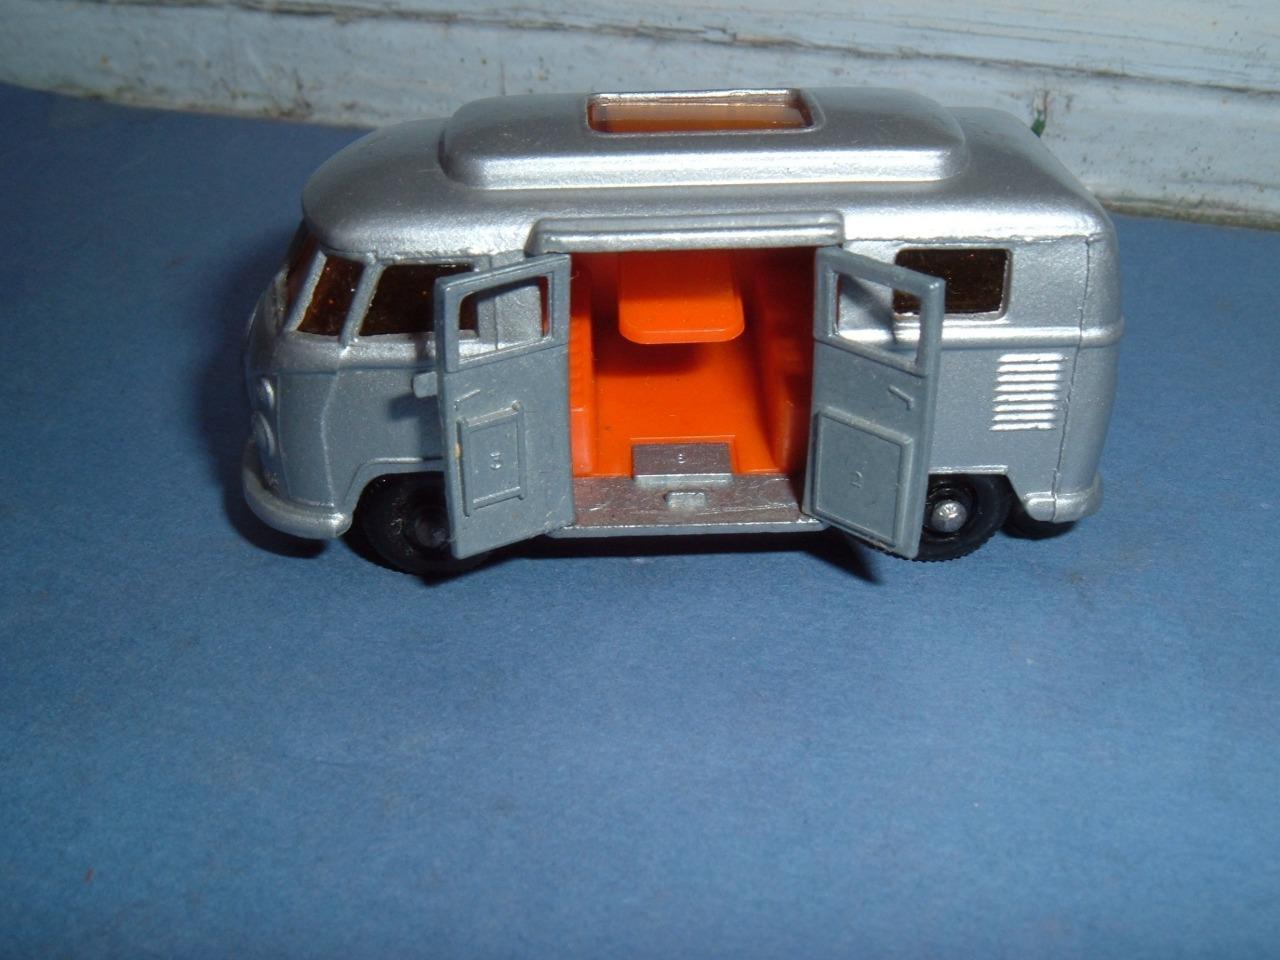 moda clasica Matchbox Matchbox Matchbox  34 Volkswagen Cocheavette Excelente Estado Original  precio razonable